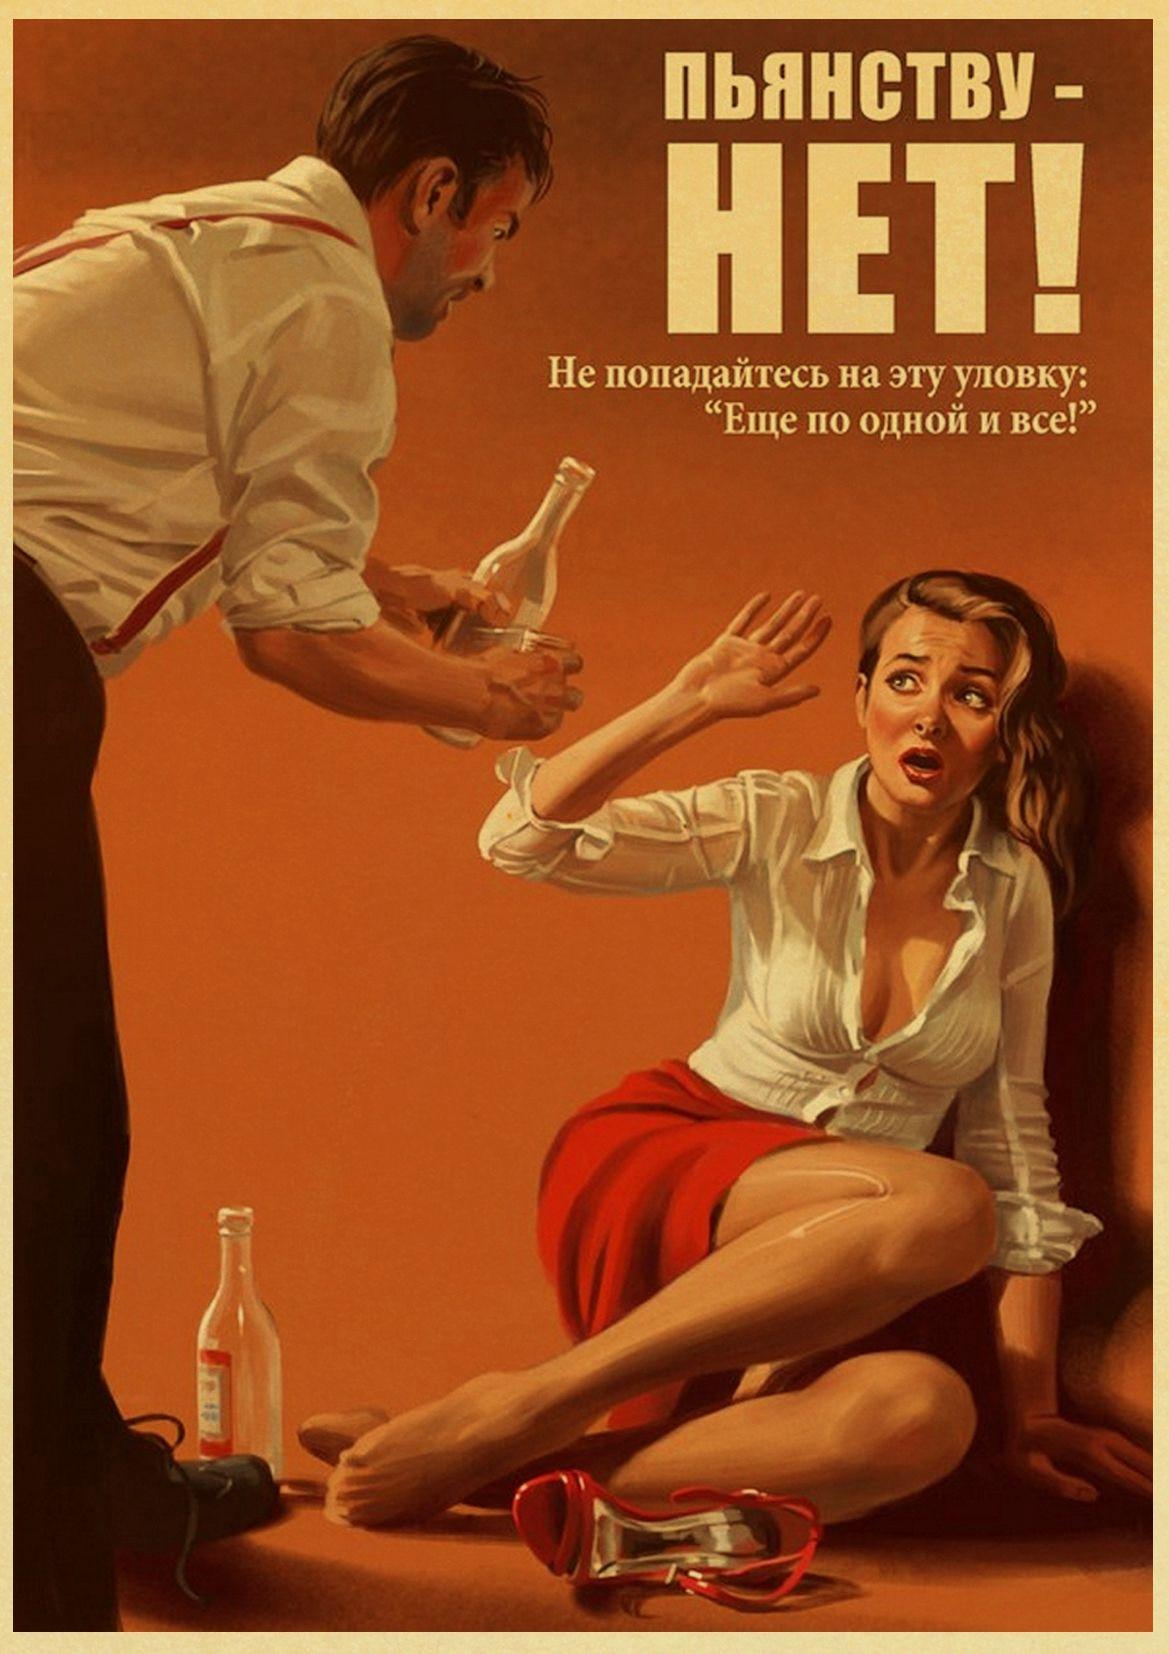 HTB1rHrpXZnrK1RjSspkq6yuvXXaR Stalin USSR CCCP Retro Poster Good Quality Printed Wall Retro Posters For Home Bar Cafe Room Wall sticker